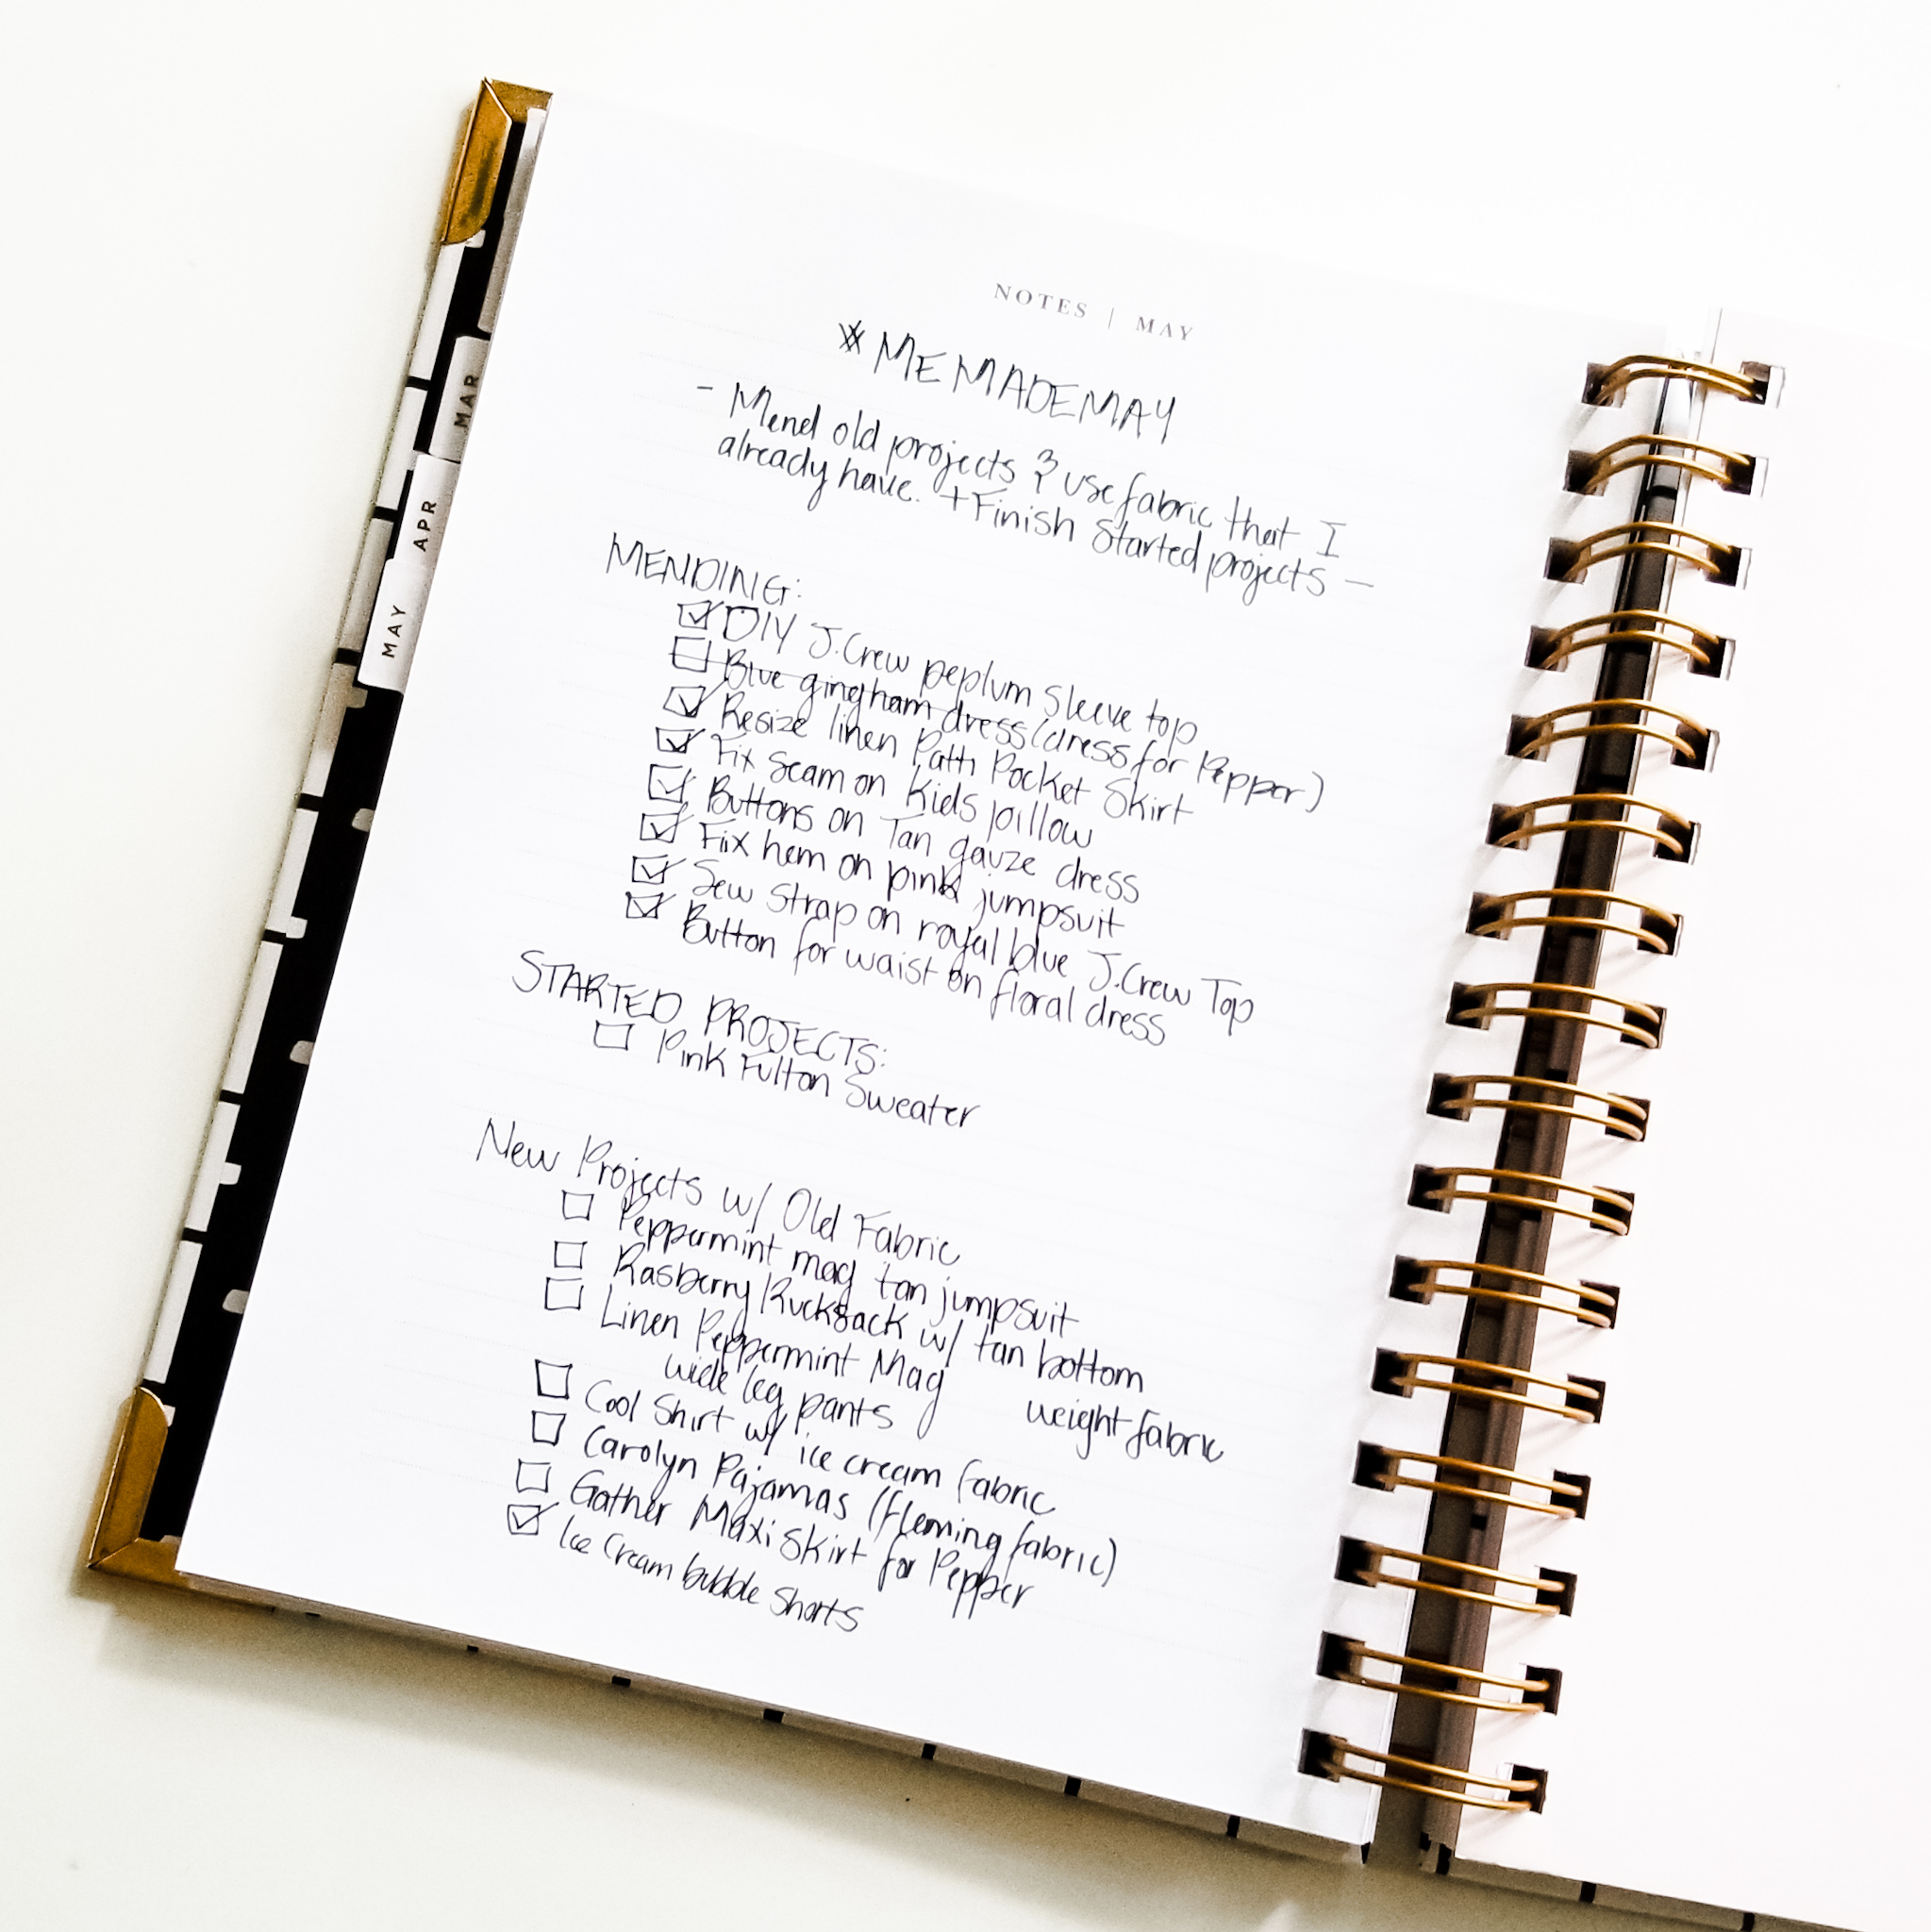 List of Goals for #Memademay2019